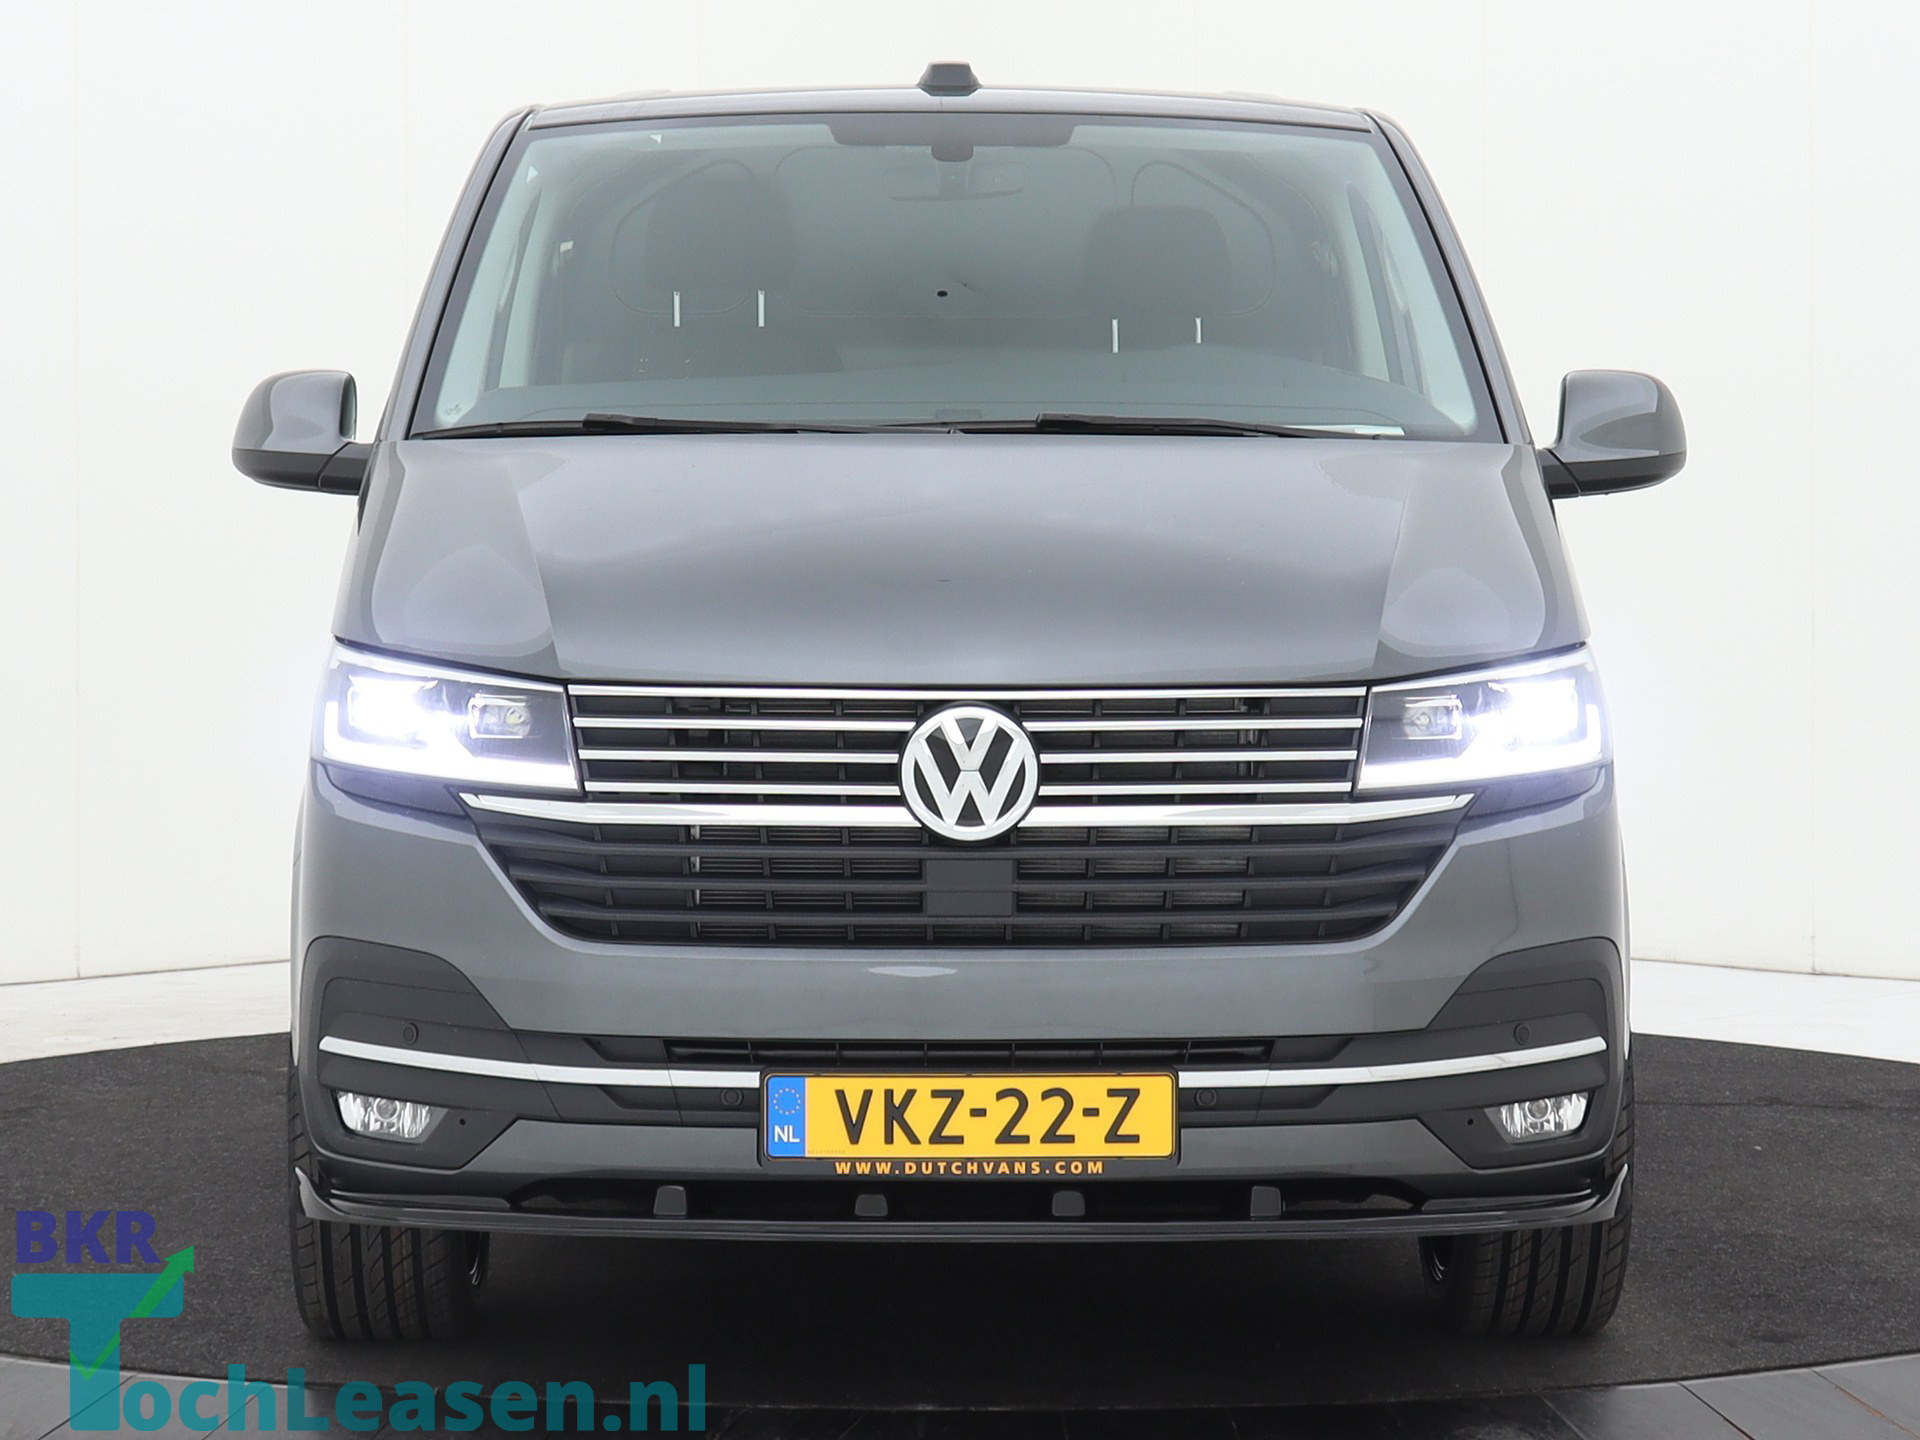 BKR toch leasen - Volkswagen Transporter - Grijs 6